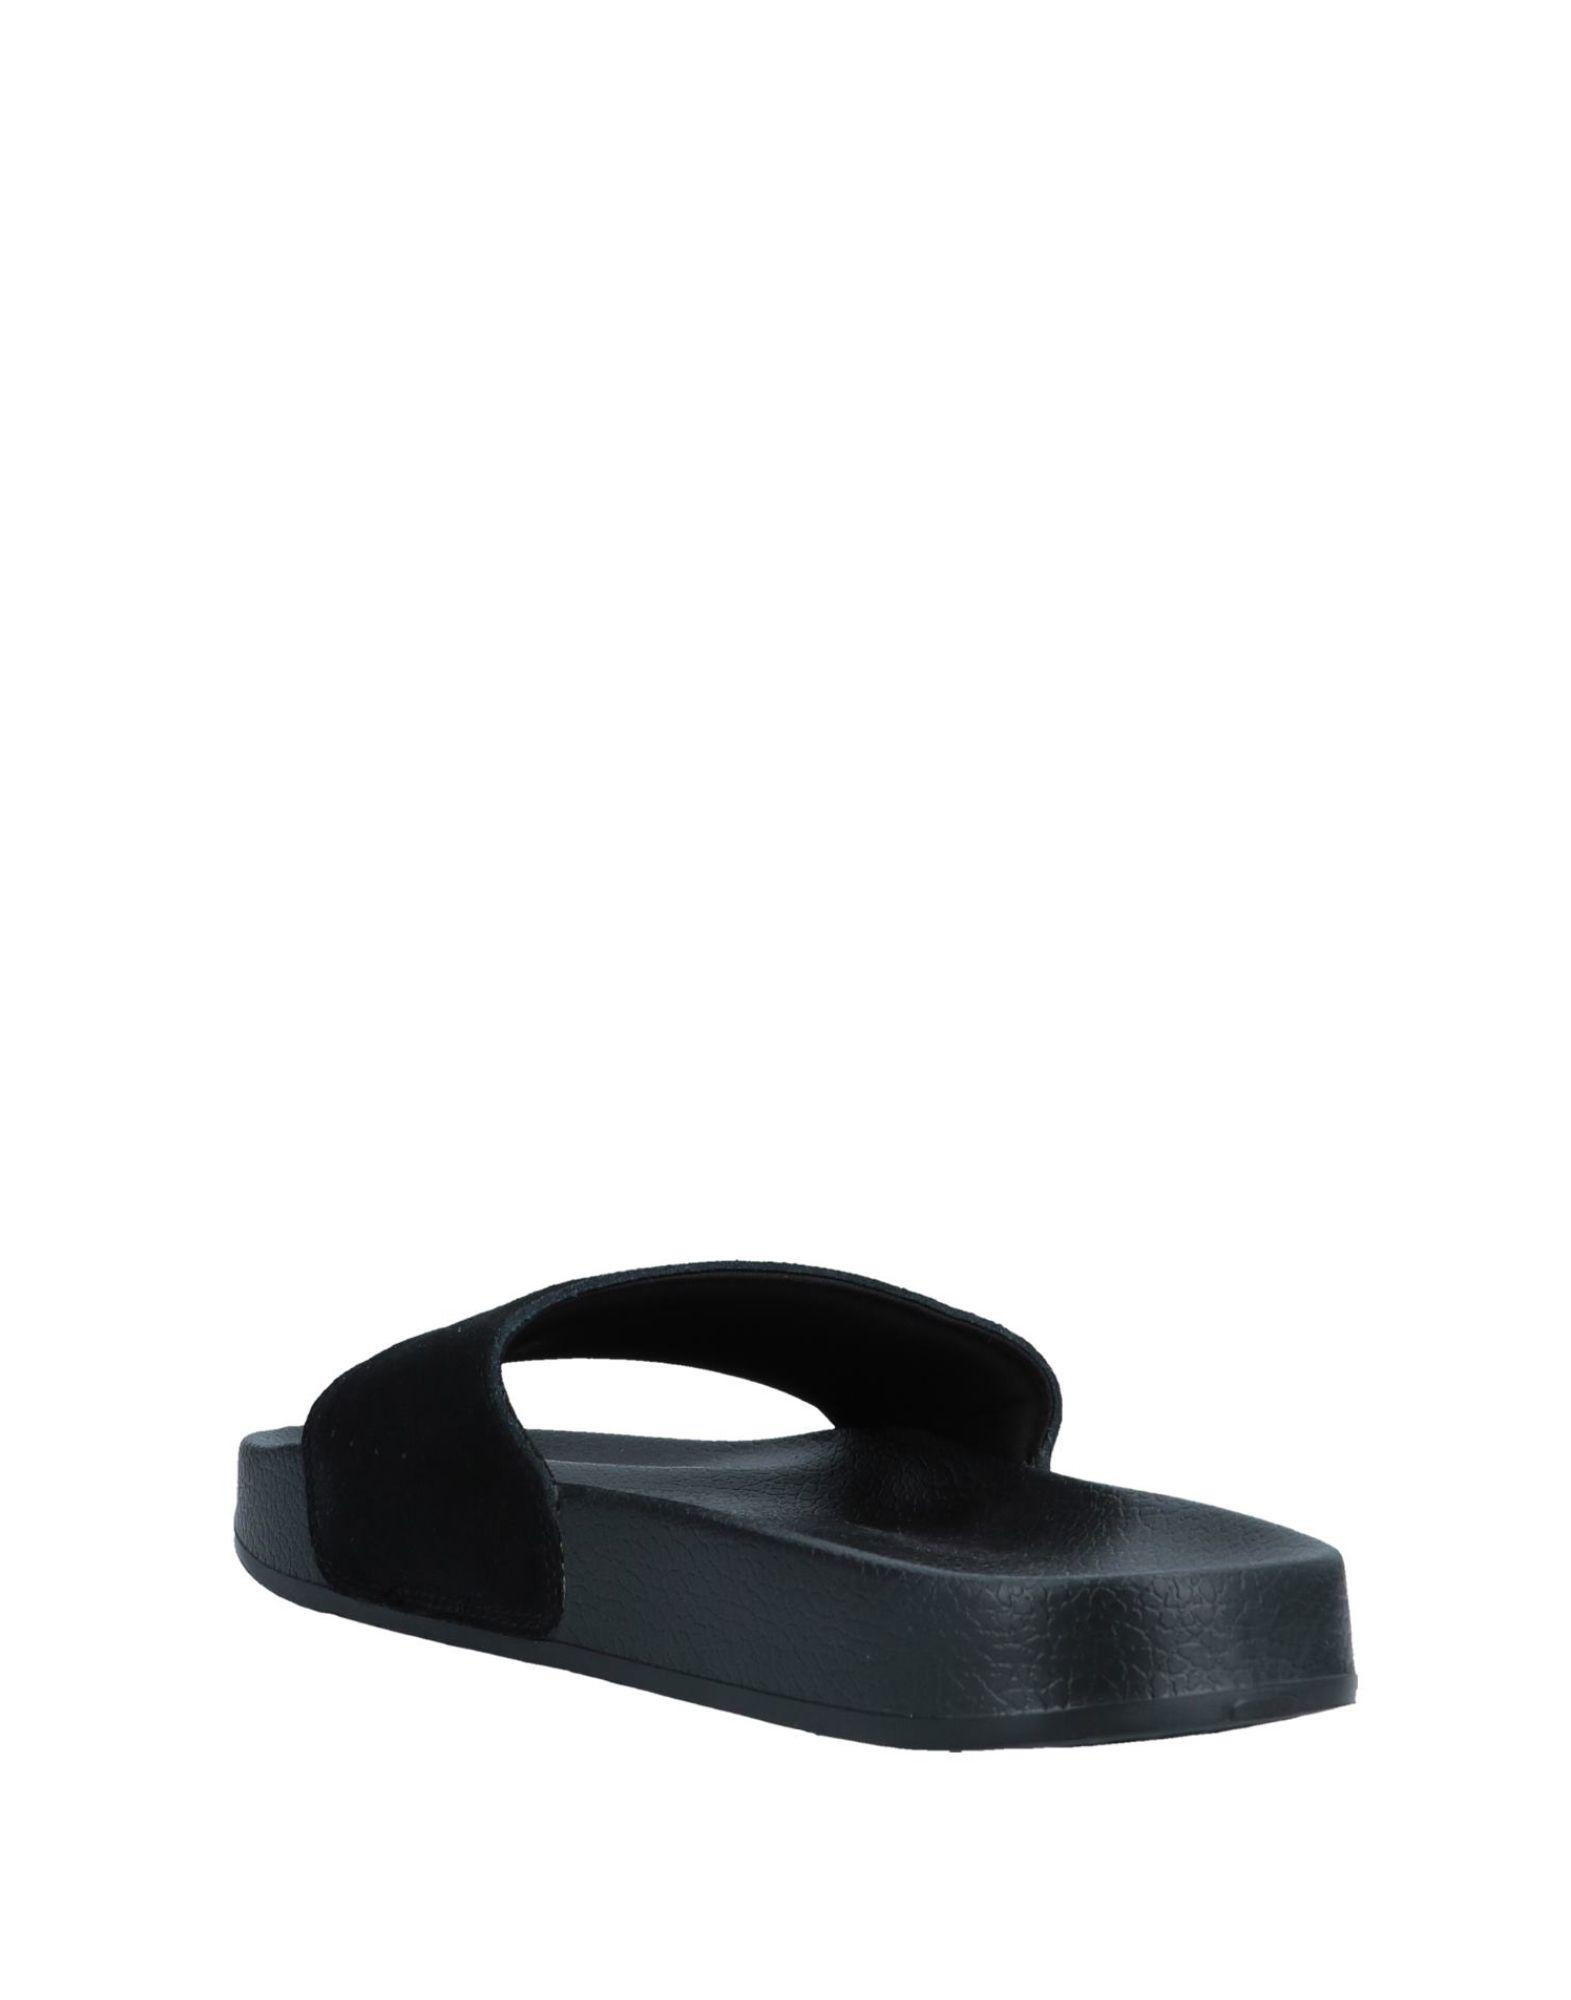 d7ae7017c23d60 Lyst - PUMA Sandals in Black for Men - Save 53%